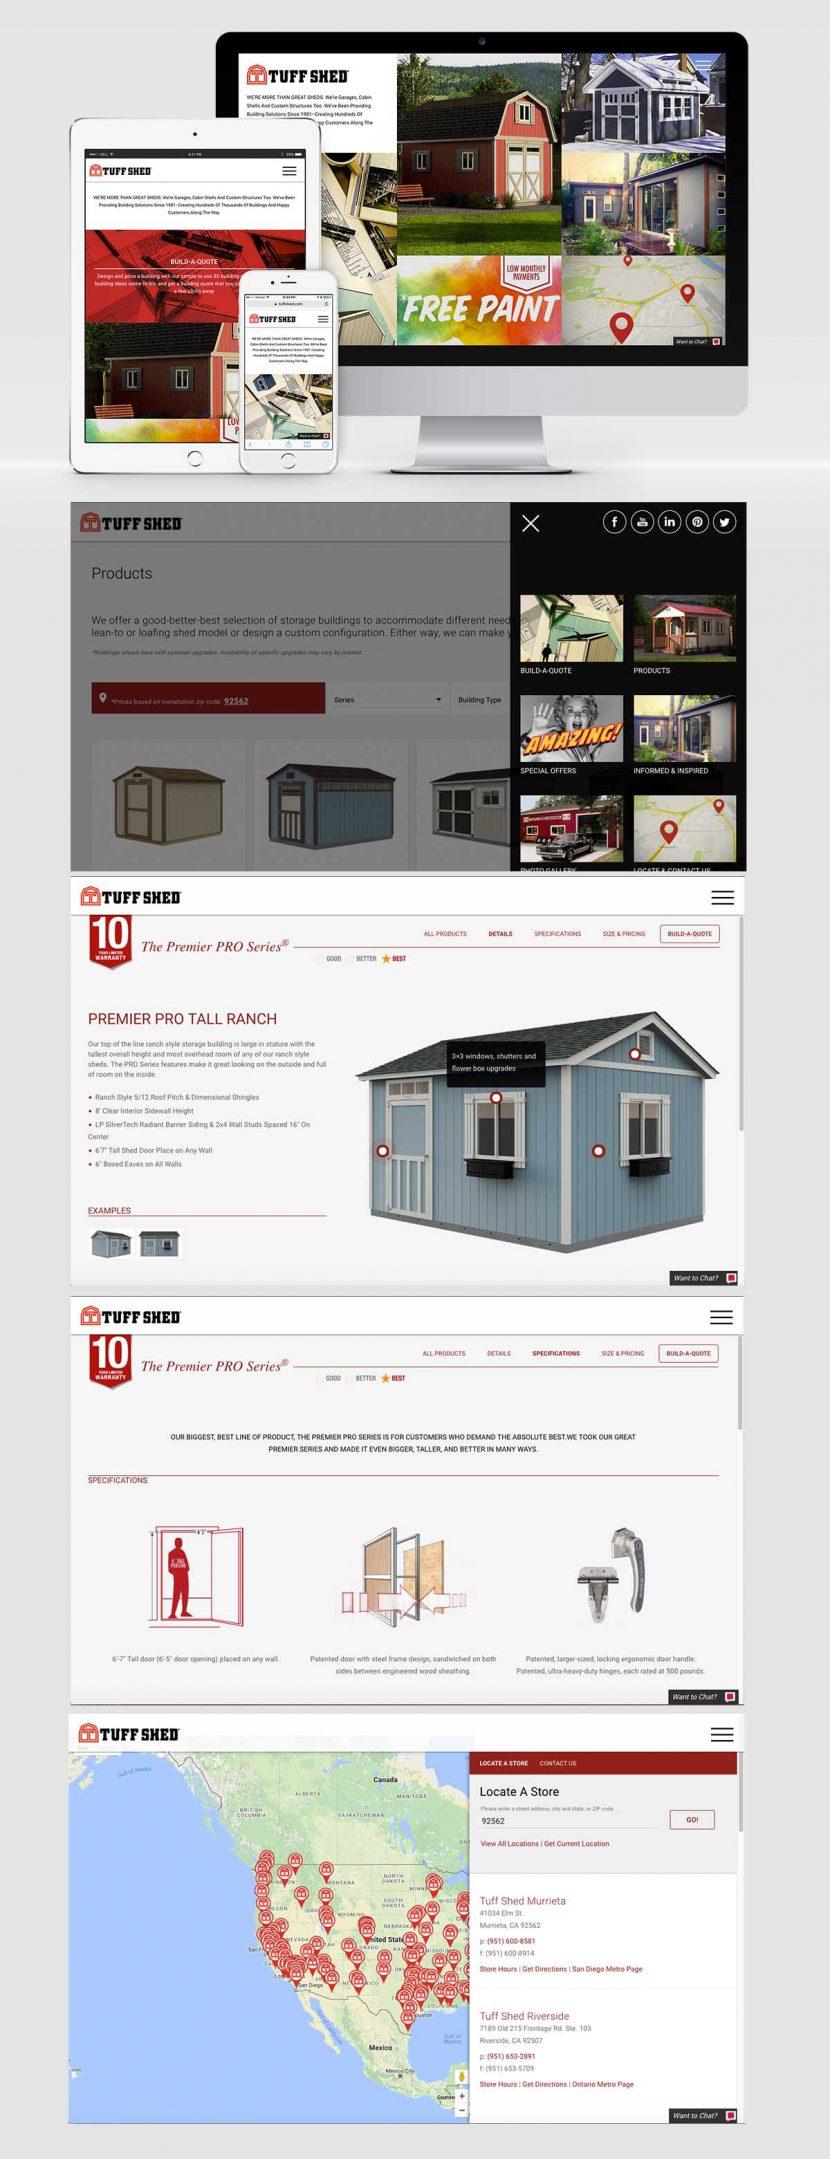 TuffShed-Web-Presentation-Long.jpg